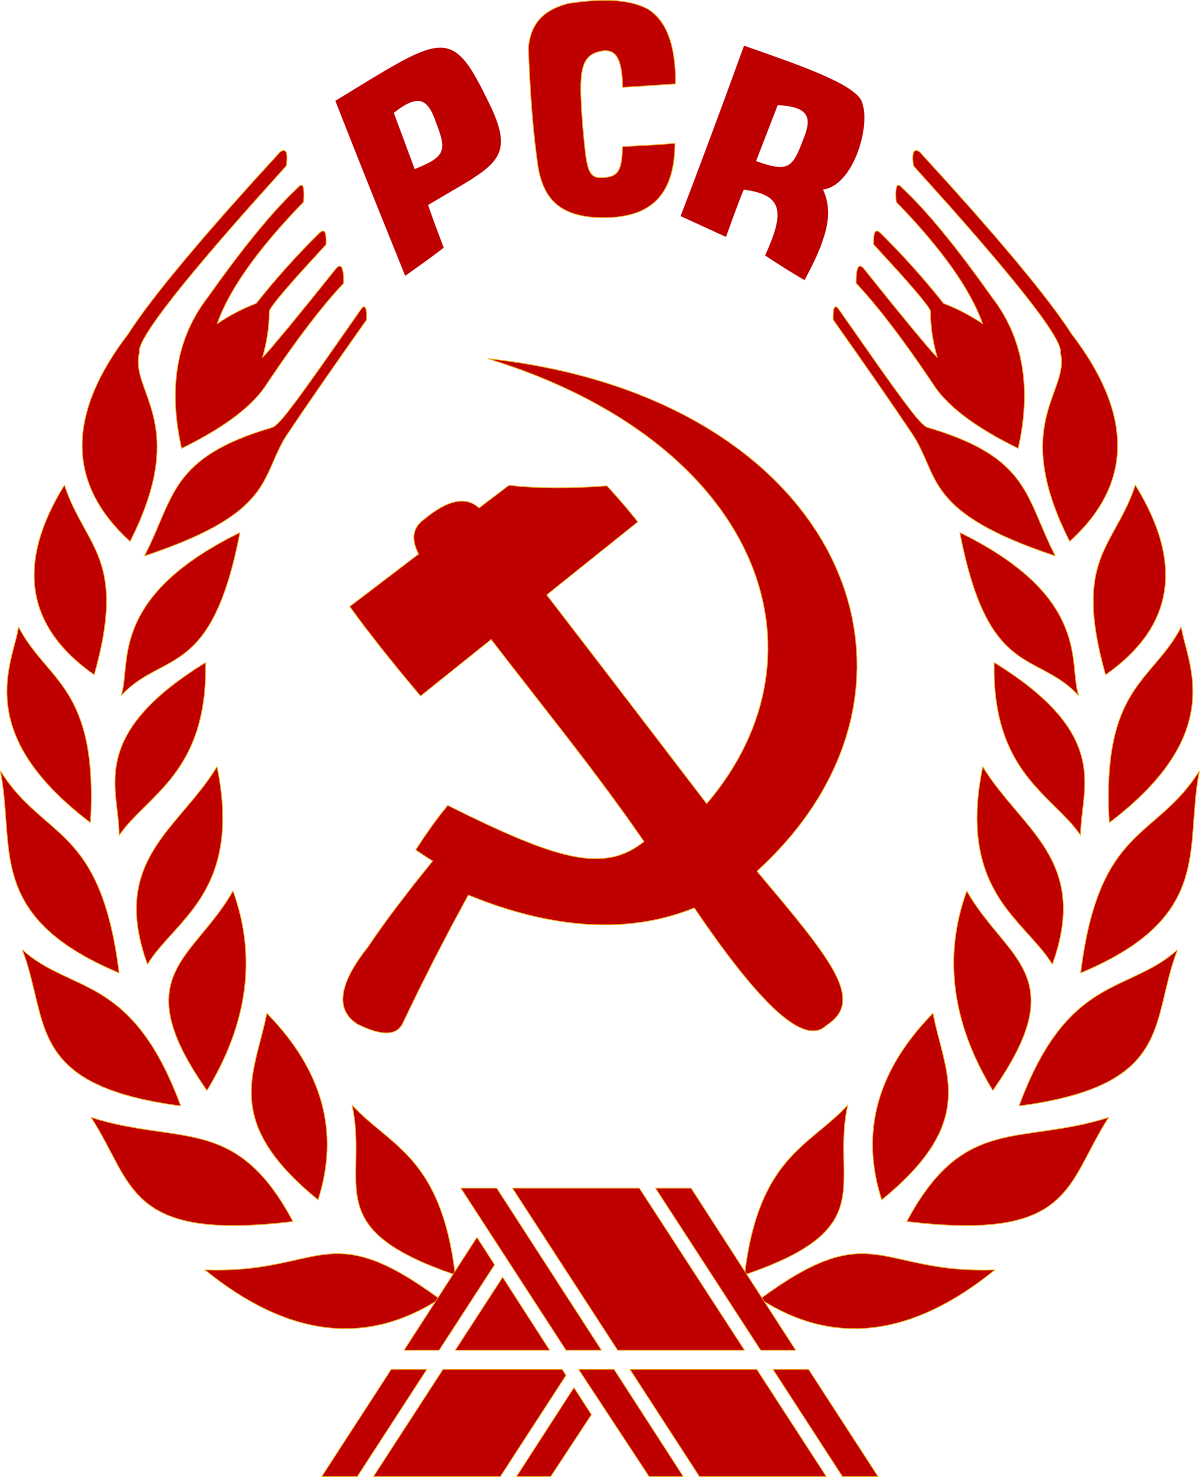 Handshake clipart socialist. Romanian communist party wikipedia